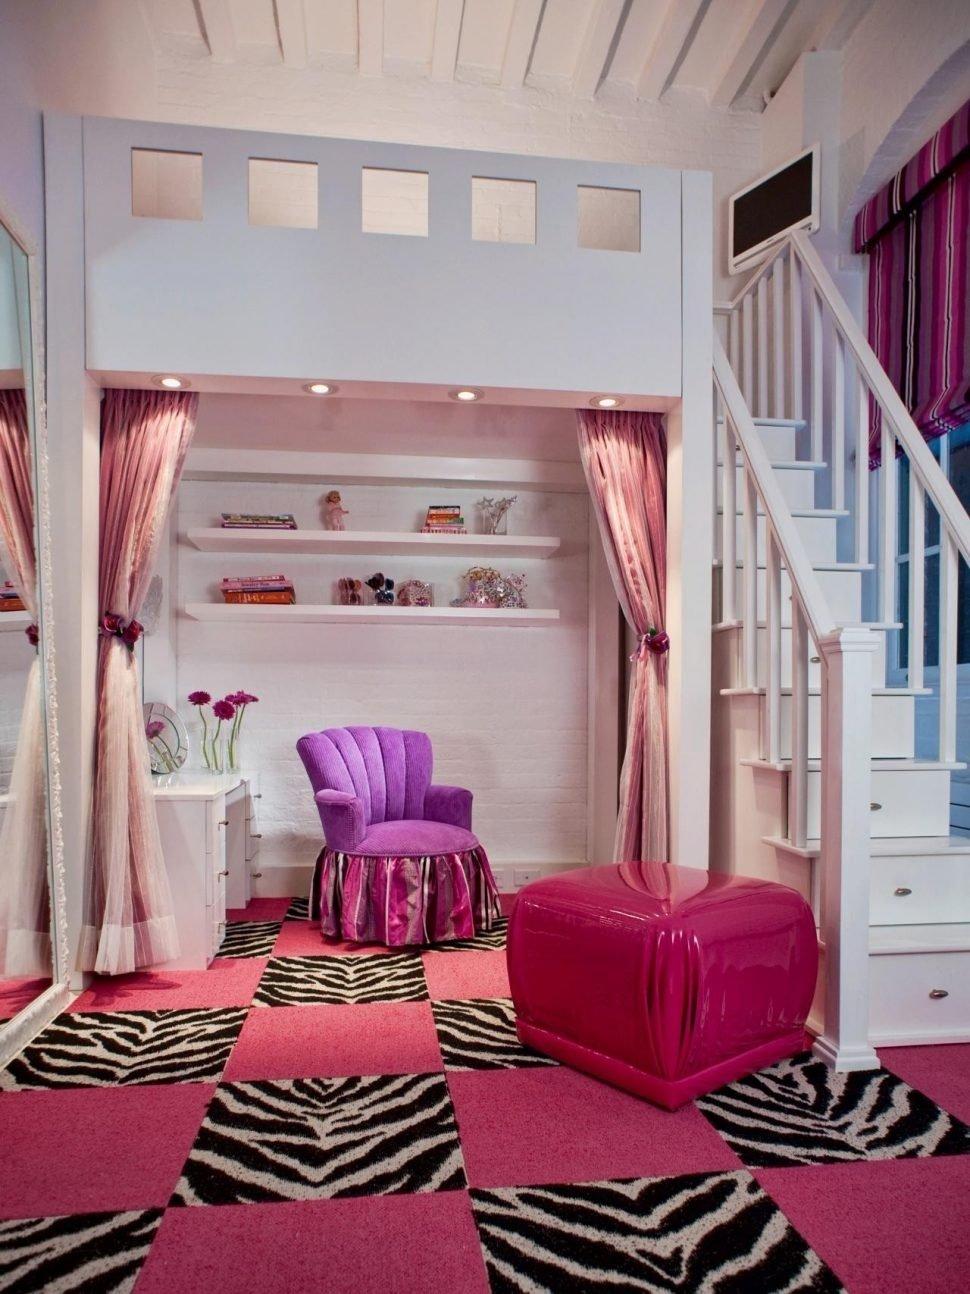 10 Pretty 10 Year Old Bedroom Ideas home design beautiful ideas modern bedroom designs girls 10 year 2020